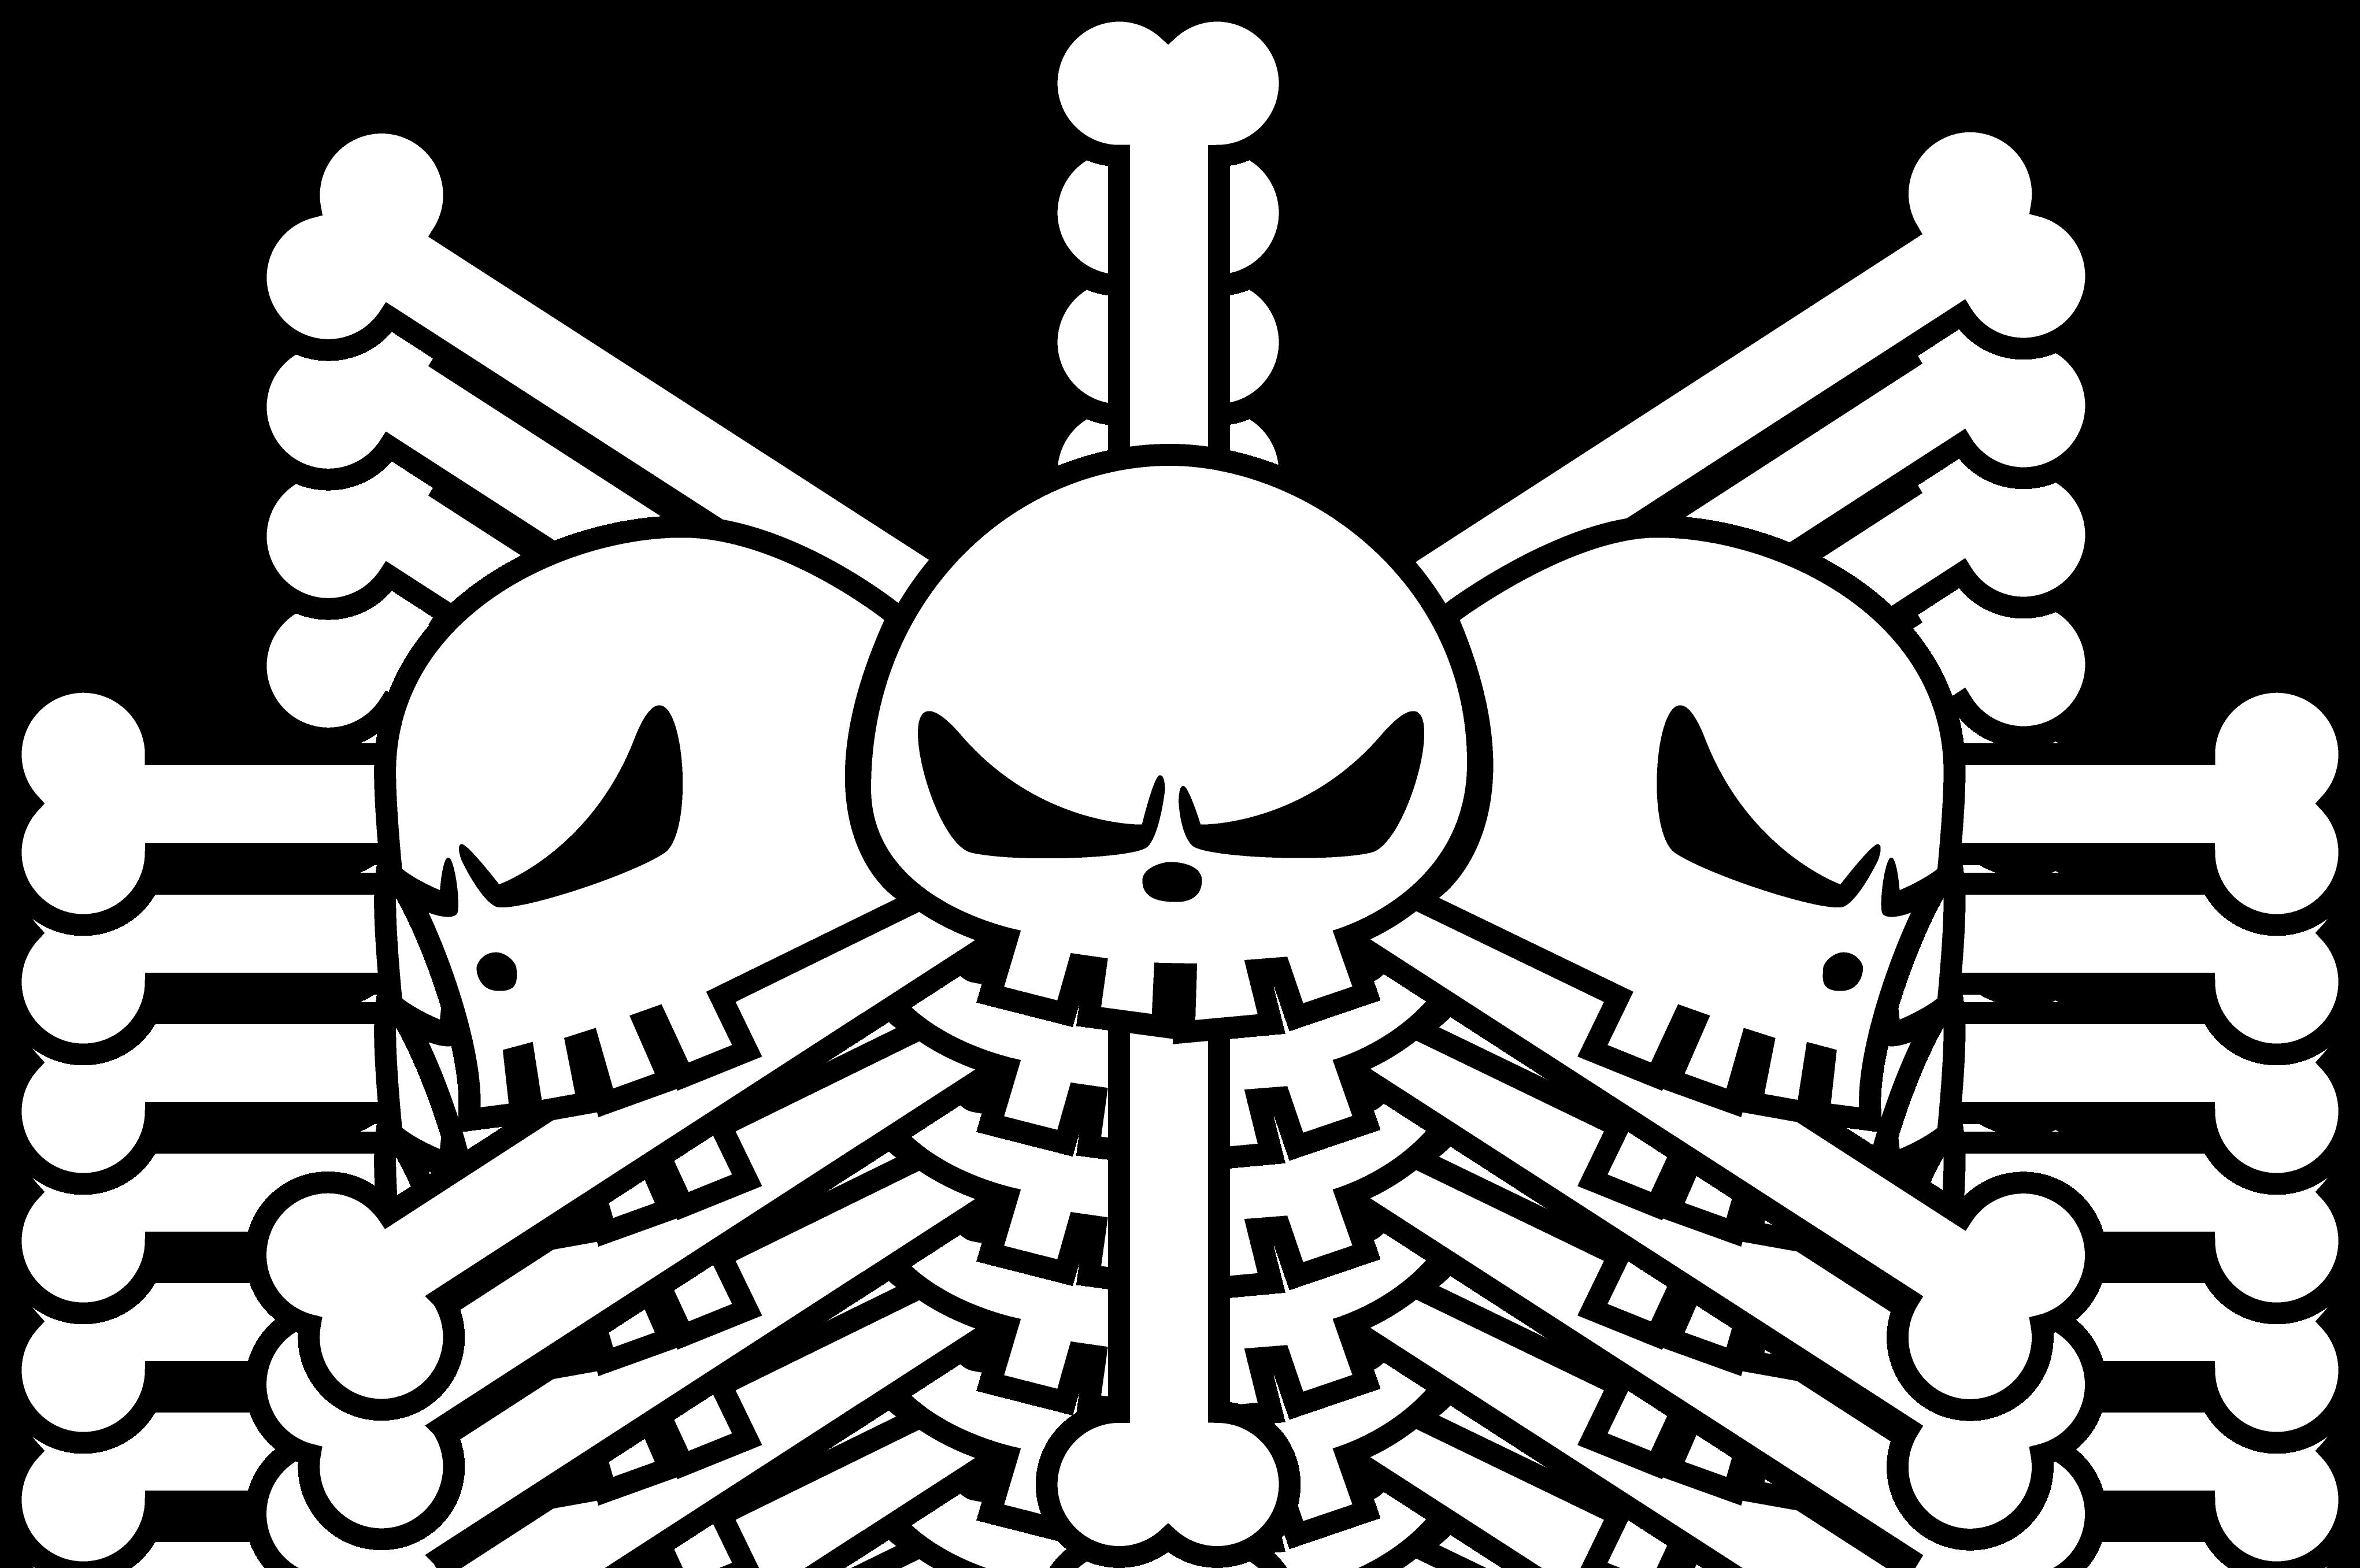 blackbeard pirate flag one piece